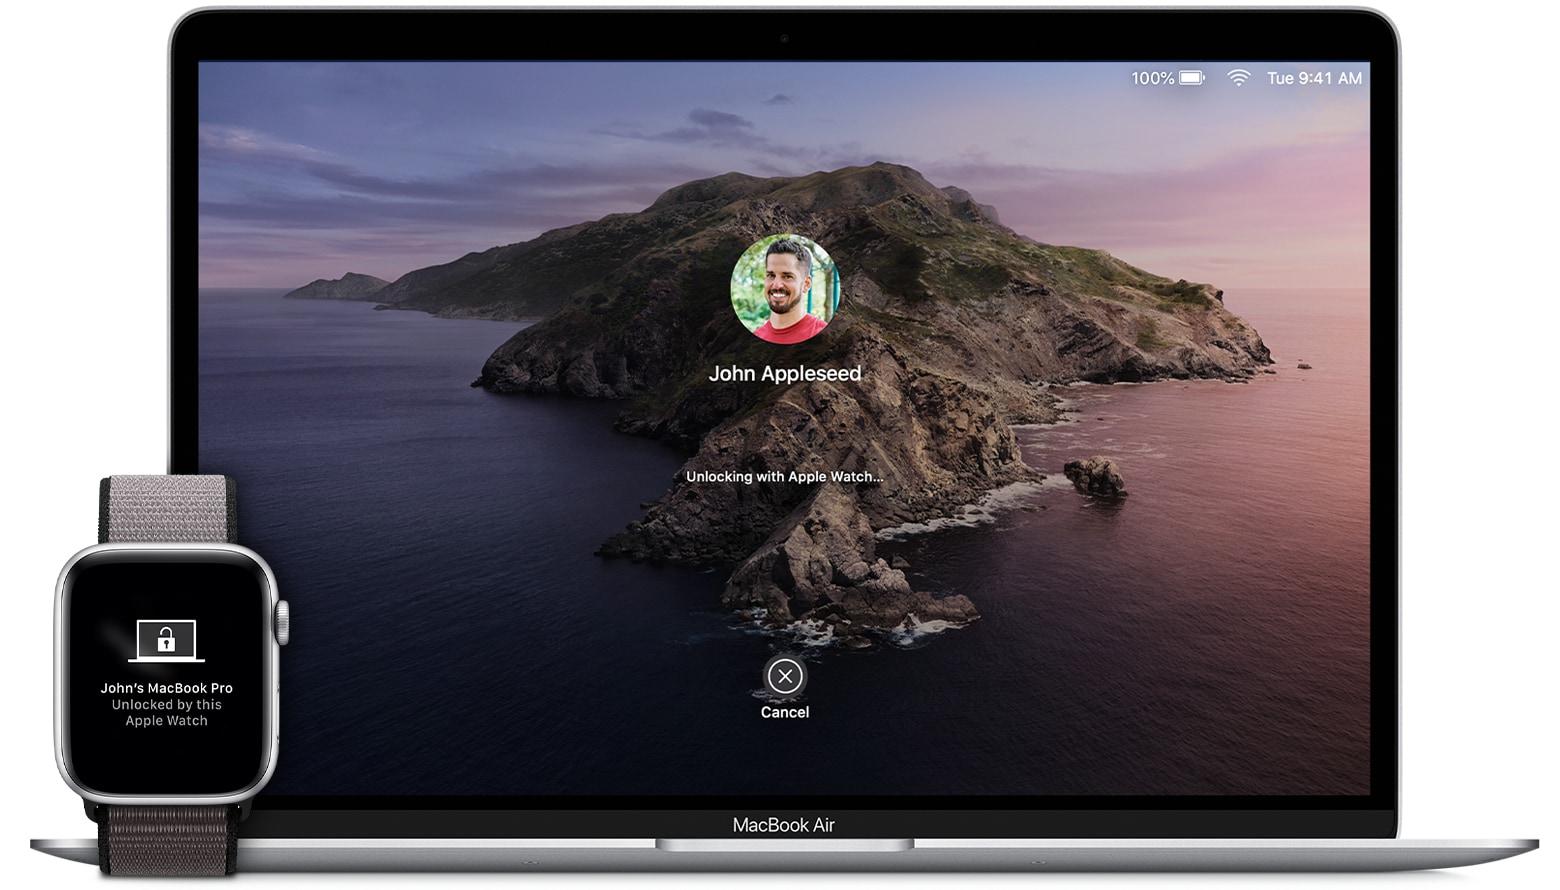 Apple Watch Unlock in action.